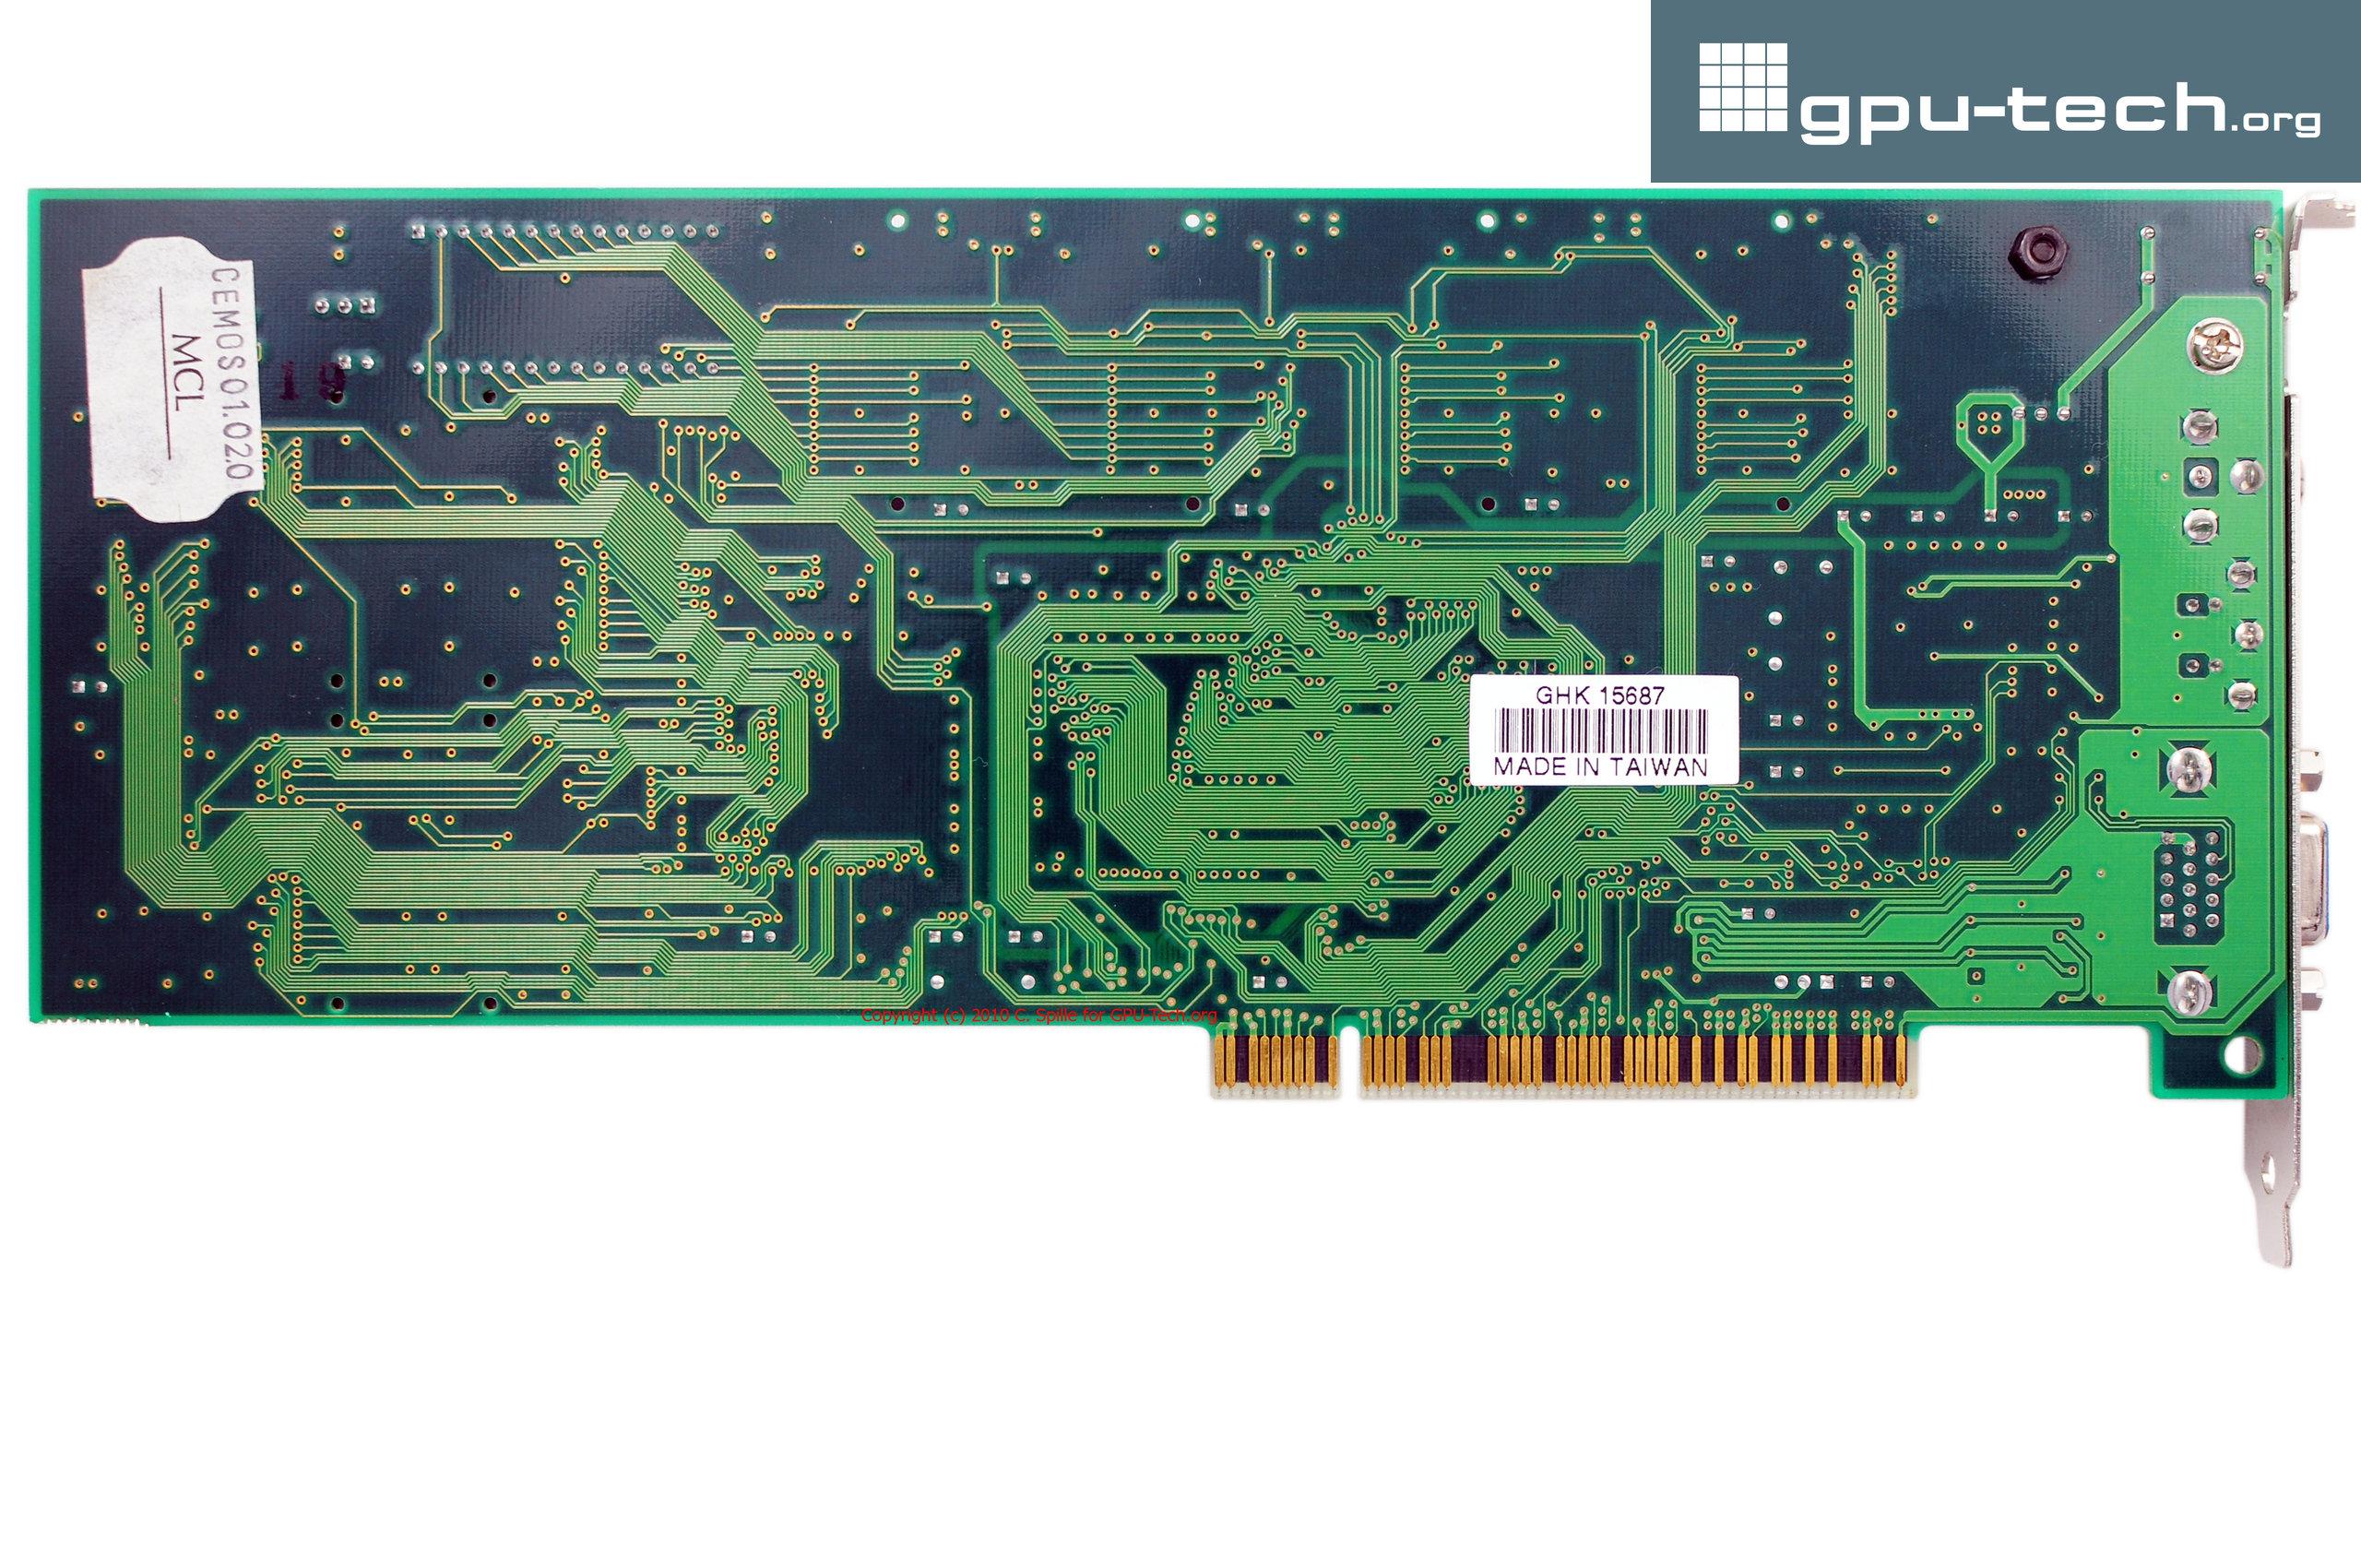 3dfx 2theMax Gainward Fantasy FX Dragon 2000 (single planar Voodoo Rush + Macronix MX86152FC) back view